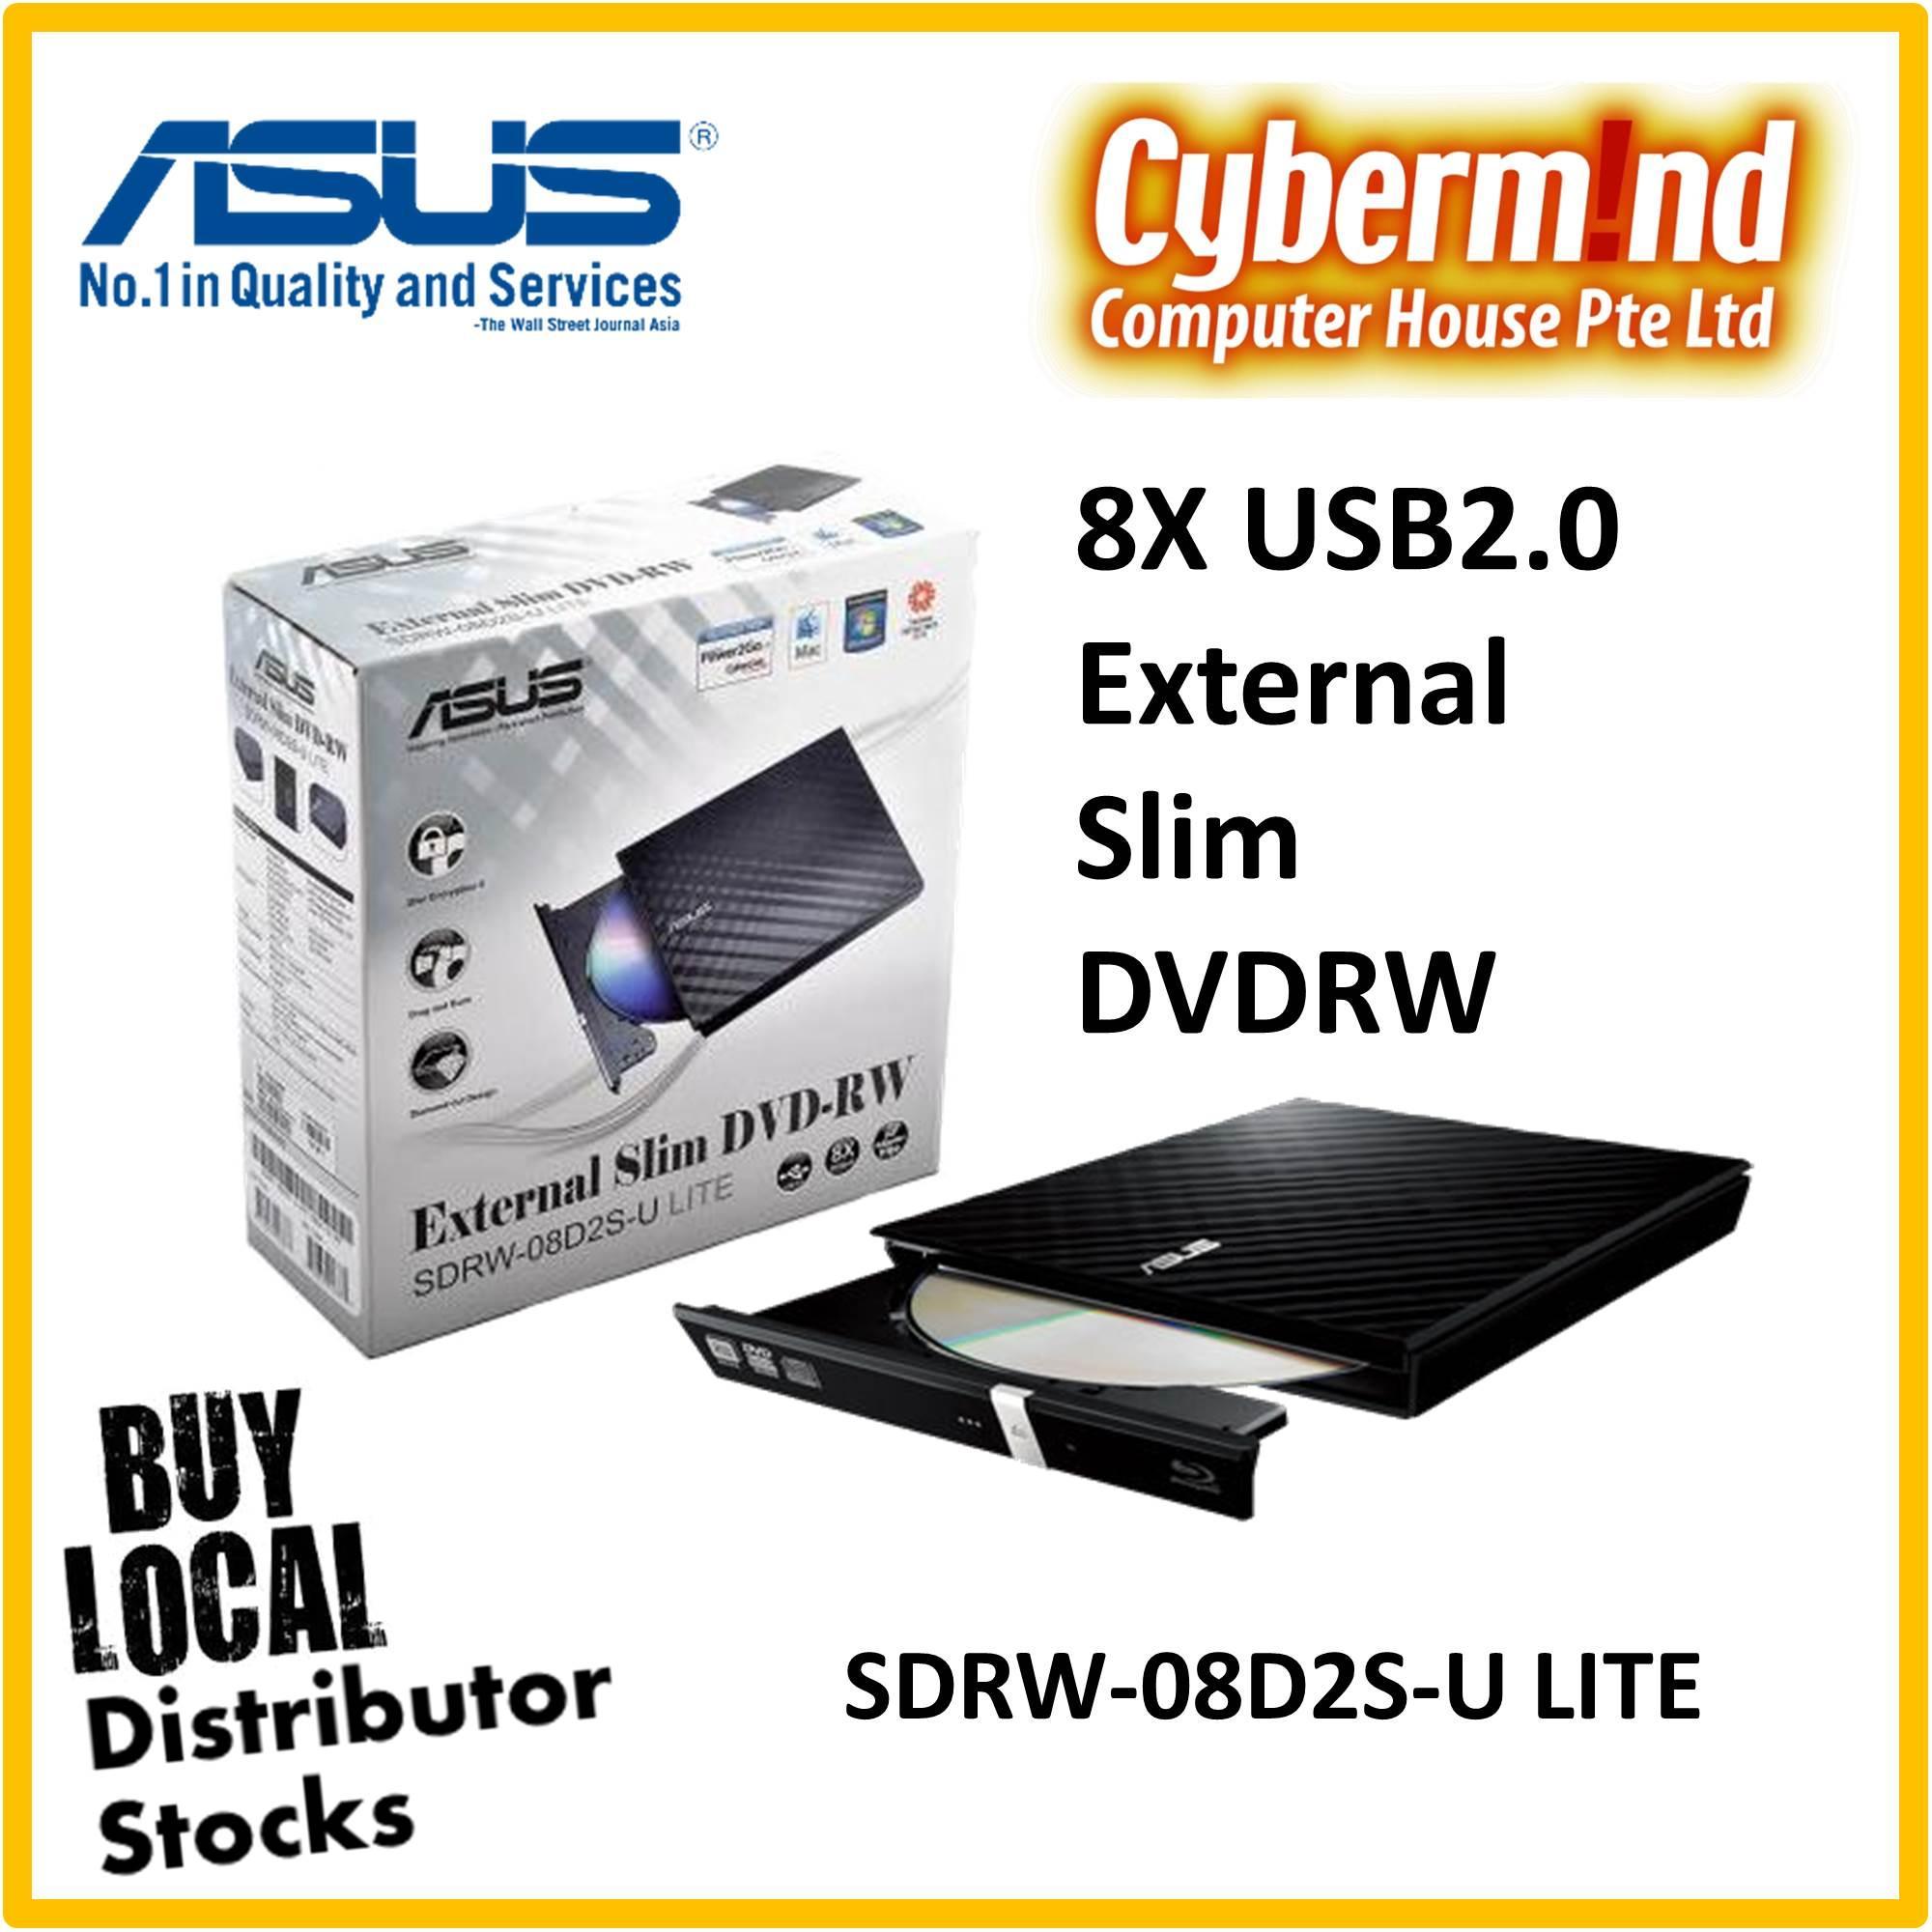 Asus 8x Usb2.0 External Slim Dvdr-W / Dvdrw (sdrw-08d2s-U Lite) Windows & Mac Compatible By Cybermind.